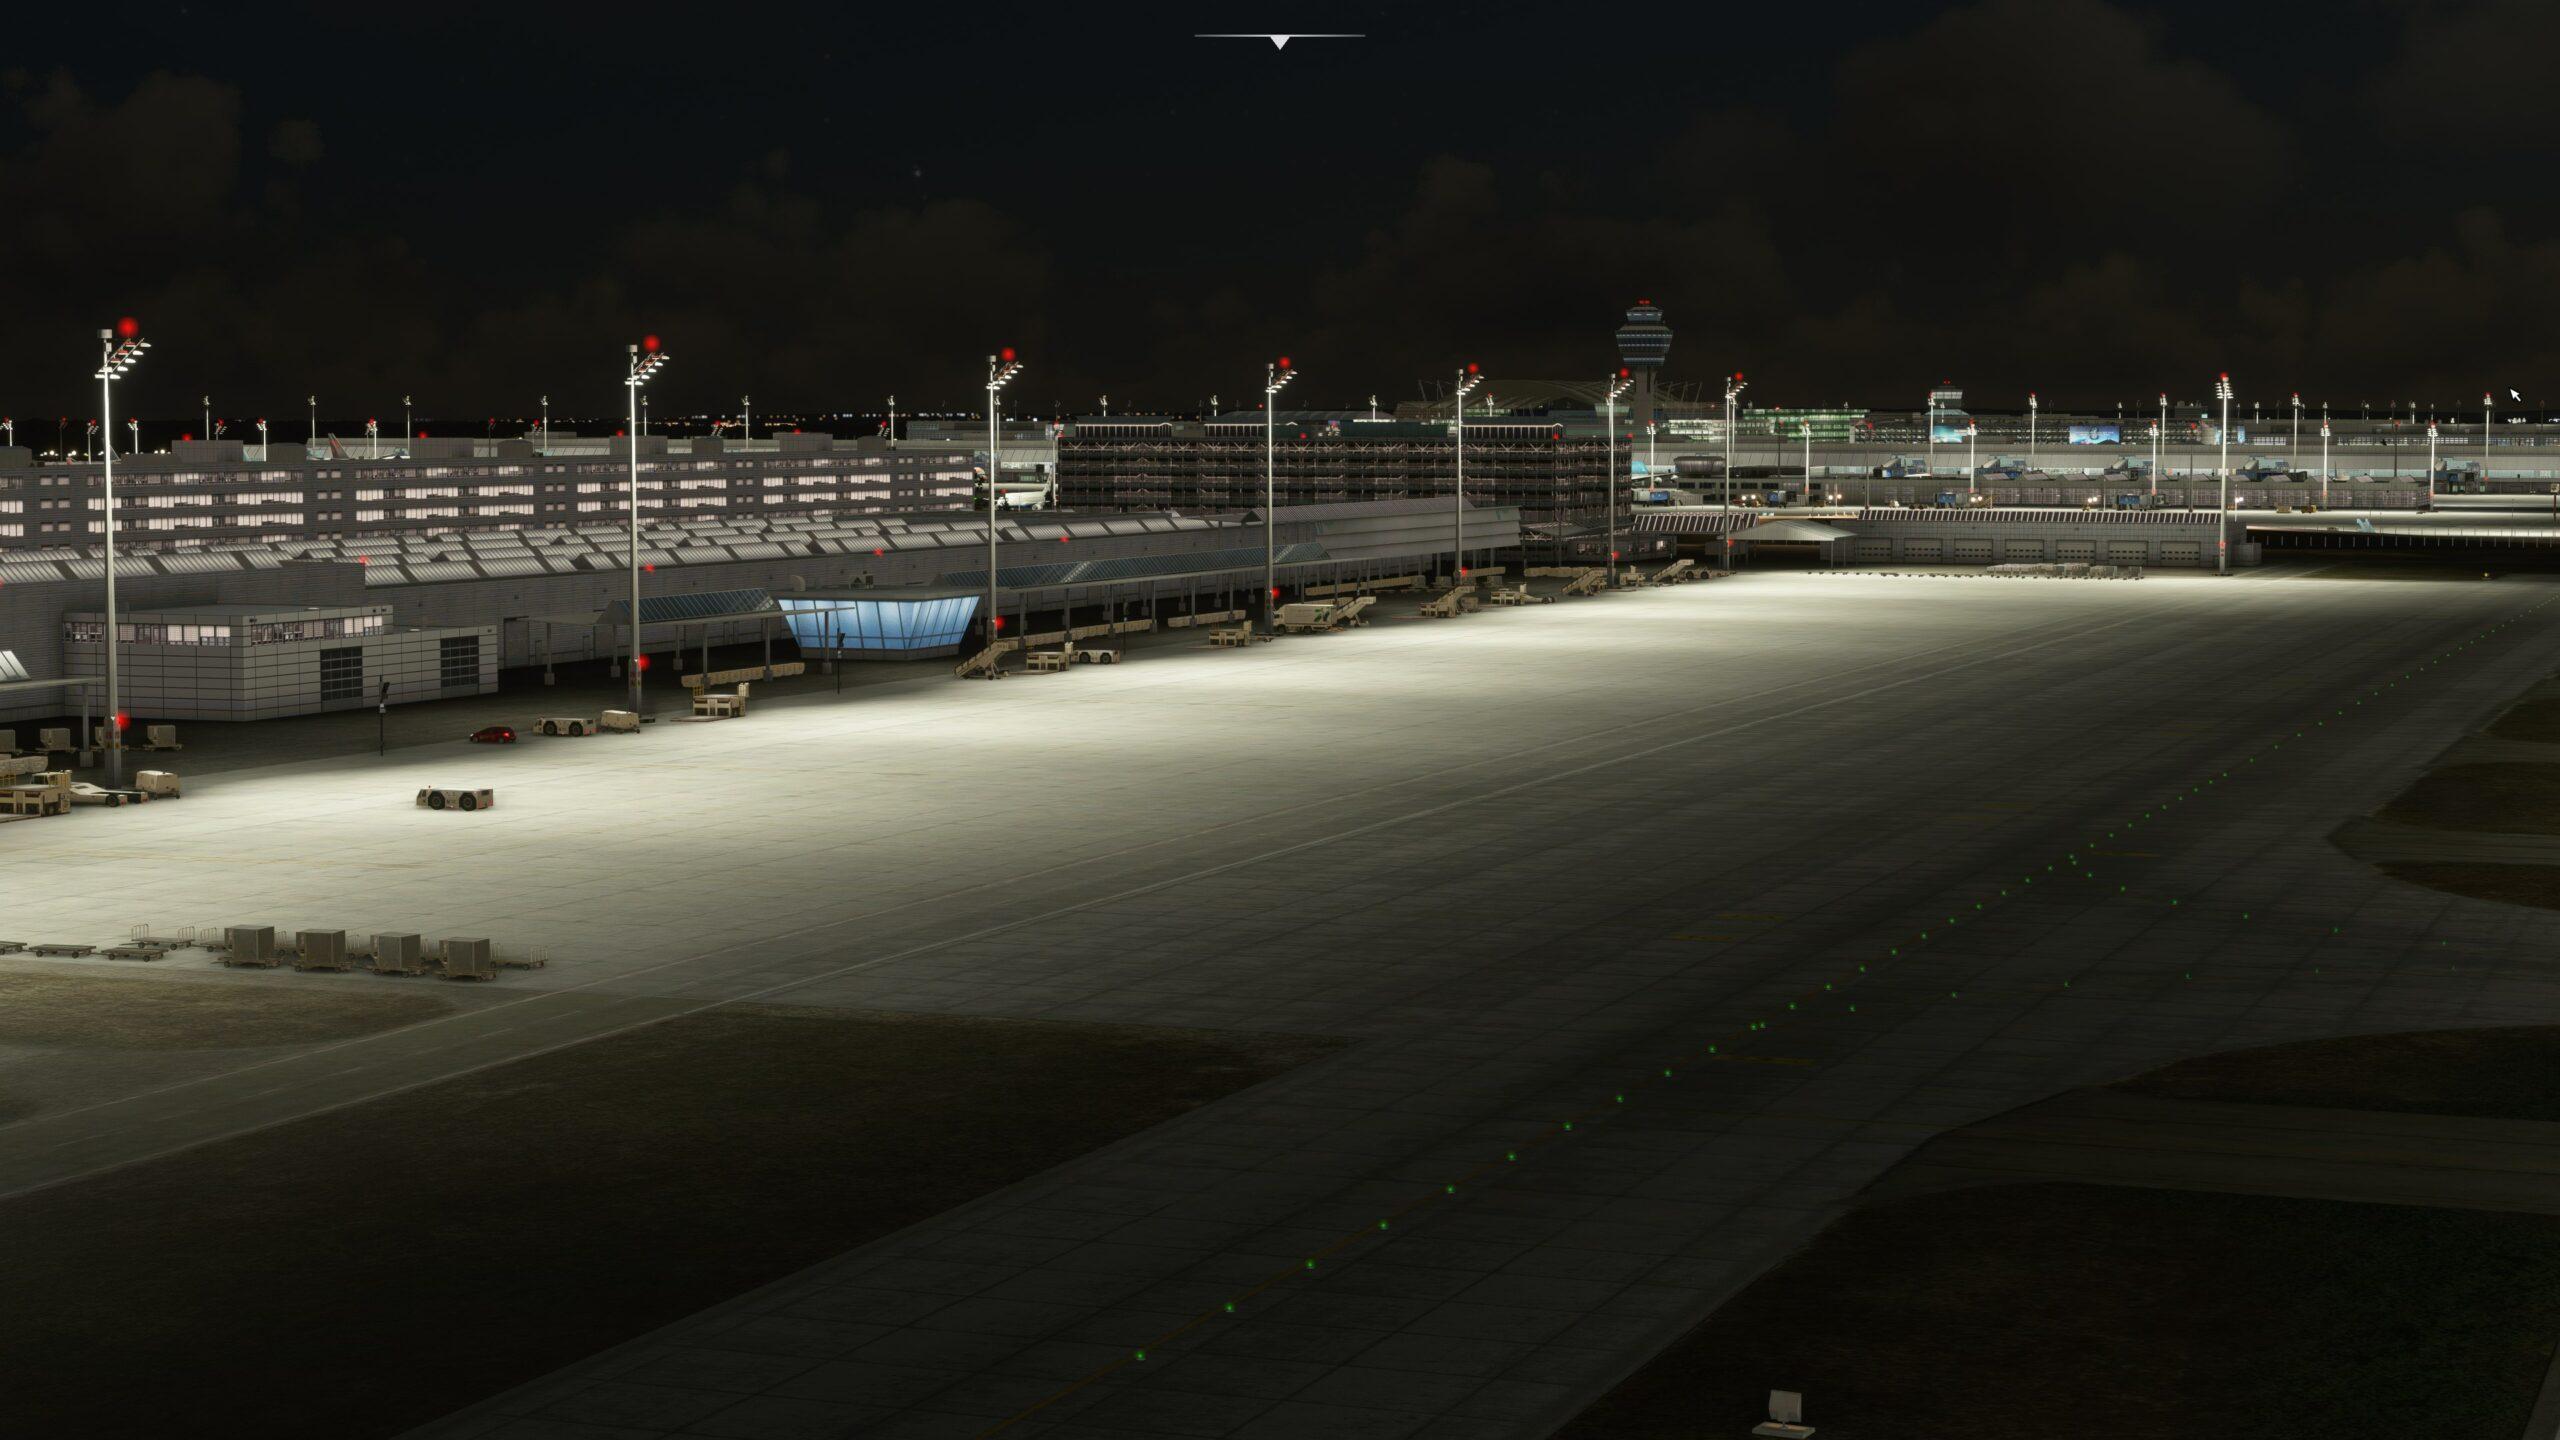 FlightSimulator_bBCw6xXY9Q